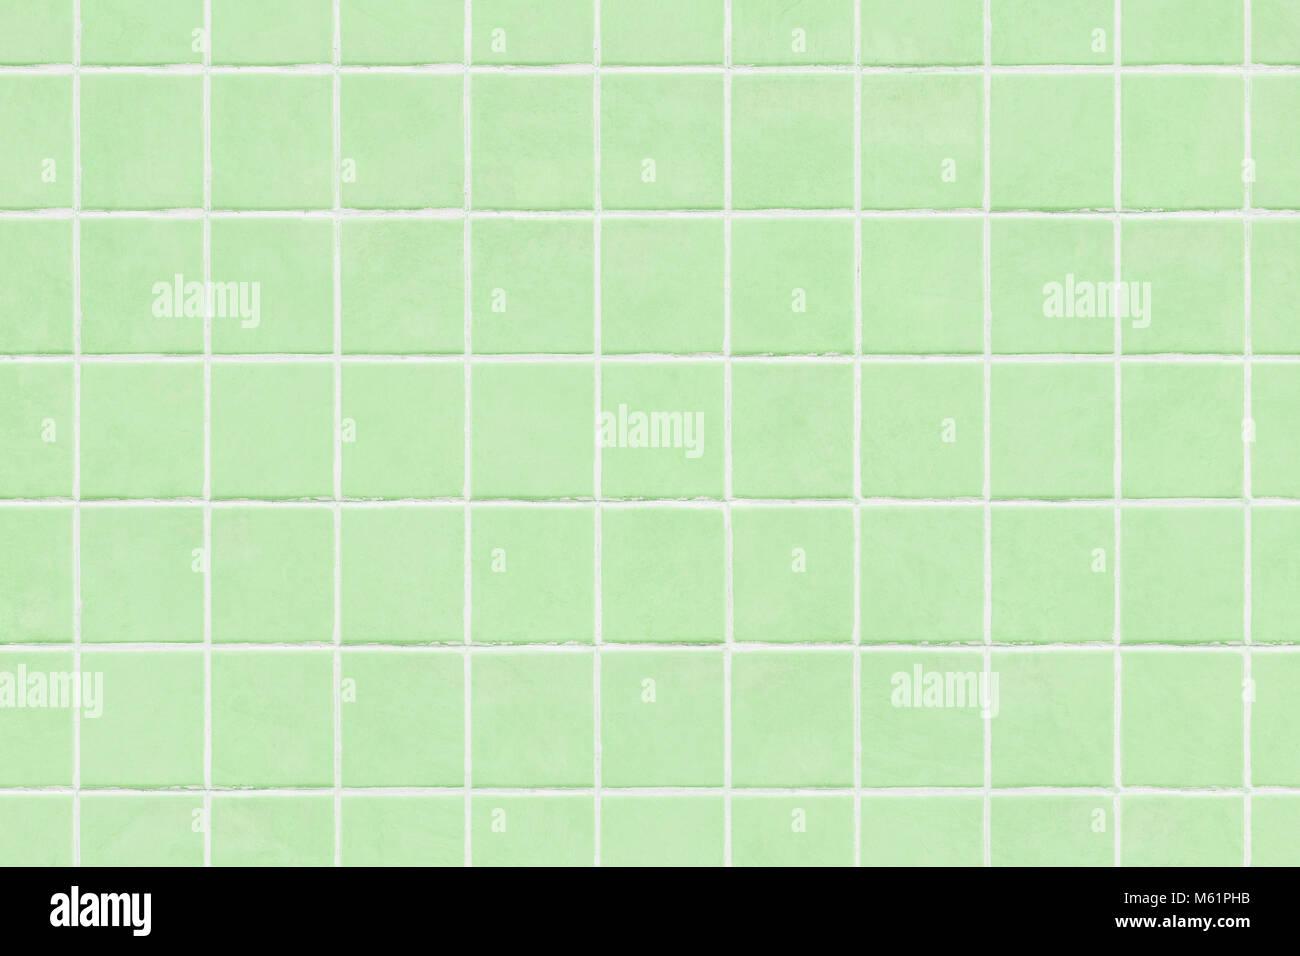 Green ceramic floor tile stock photos green ceramic floor tile green tile wall texture background stock image dailygadgetfo Image collections